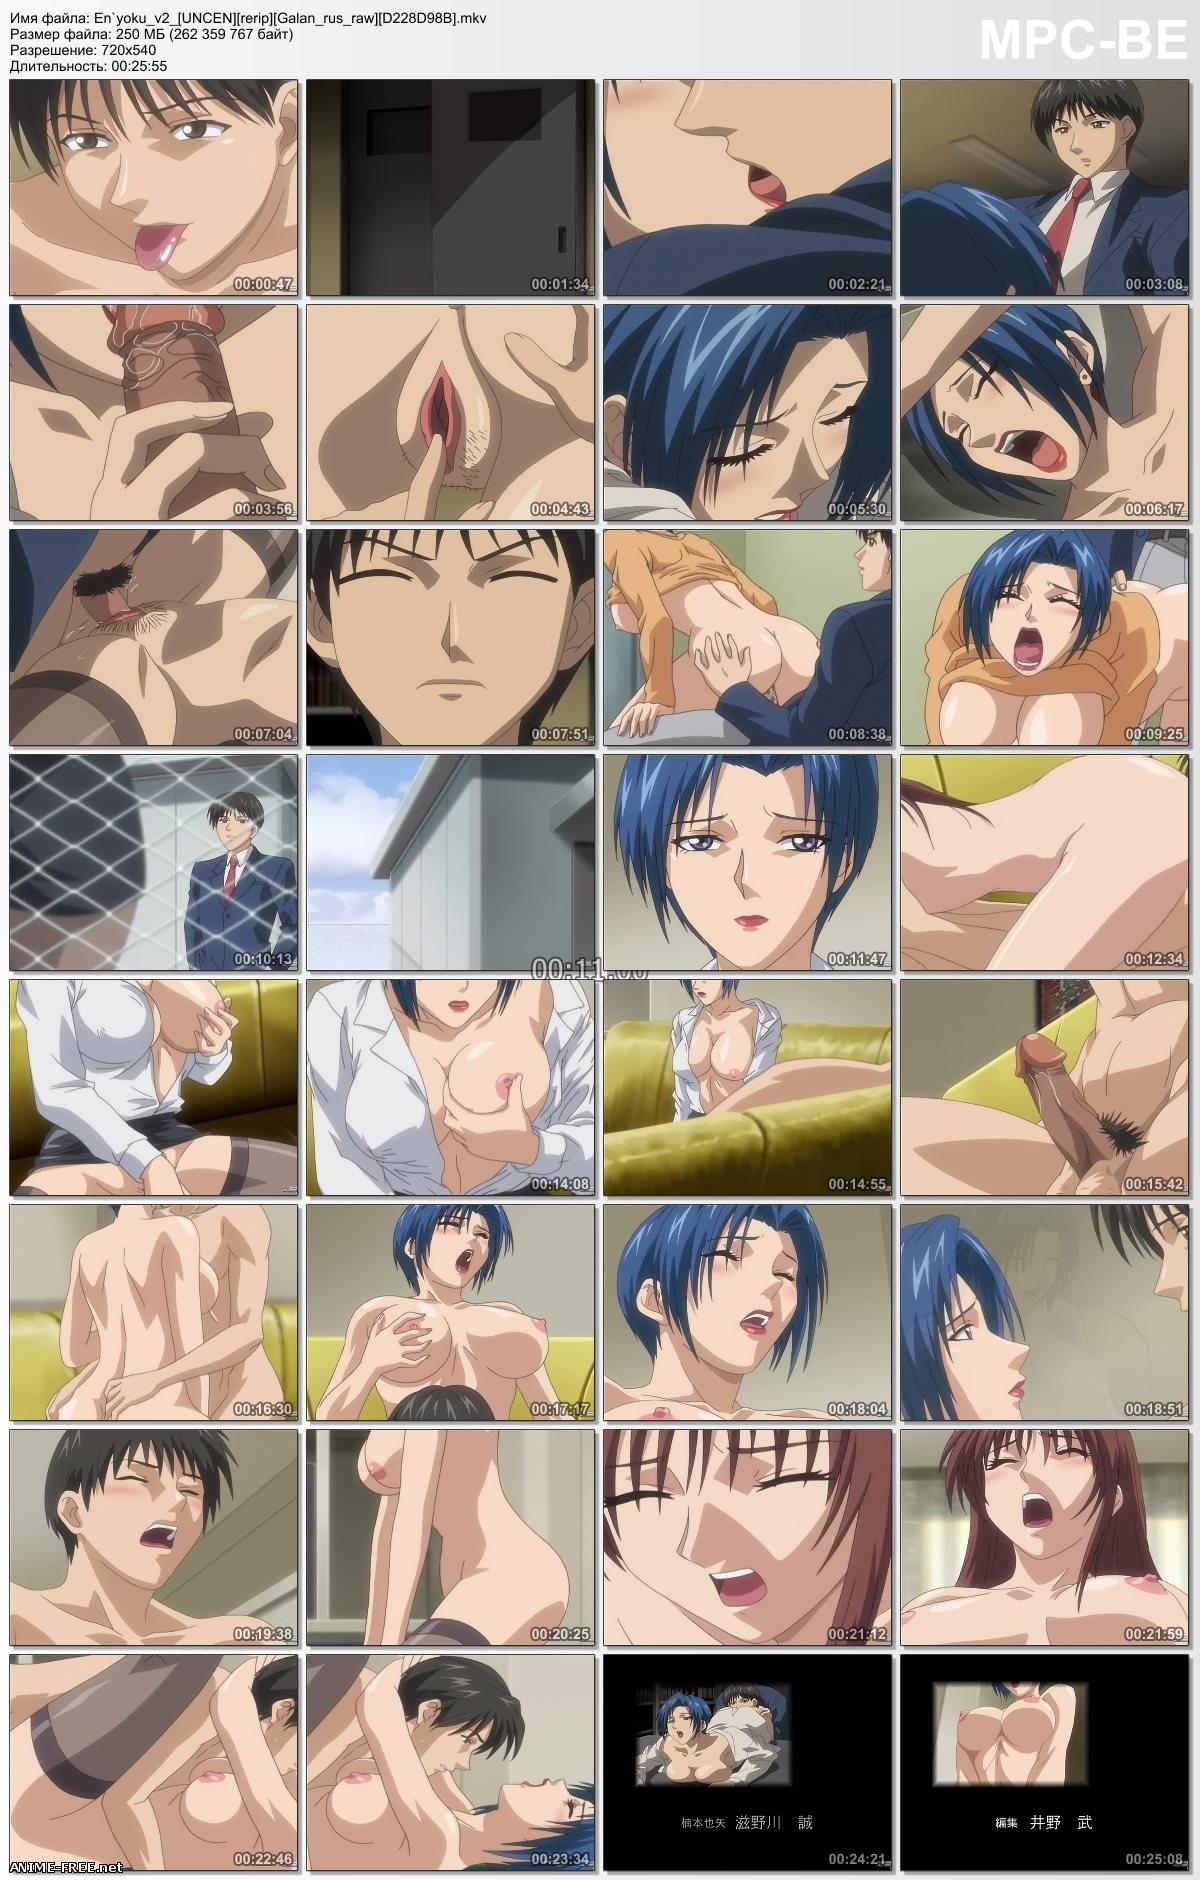 Enyoku / Enyoku - Captivating Lust / Энёку - Пленительная похоть [Ep.1] [JPN,ENG,RUS] Anime Hentai